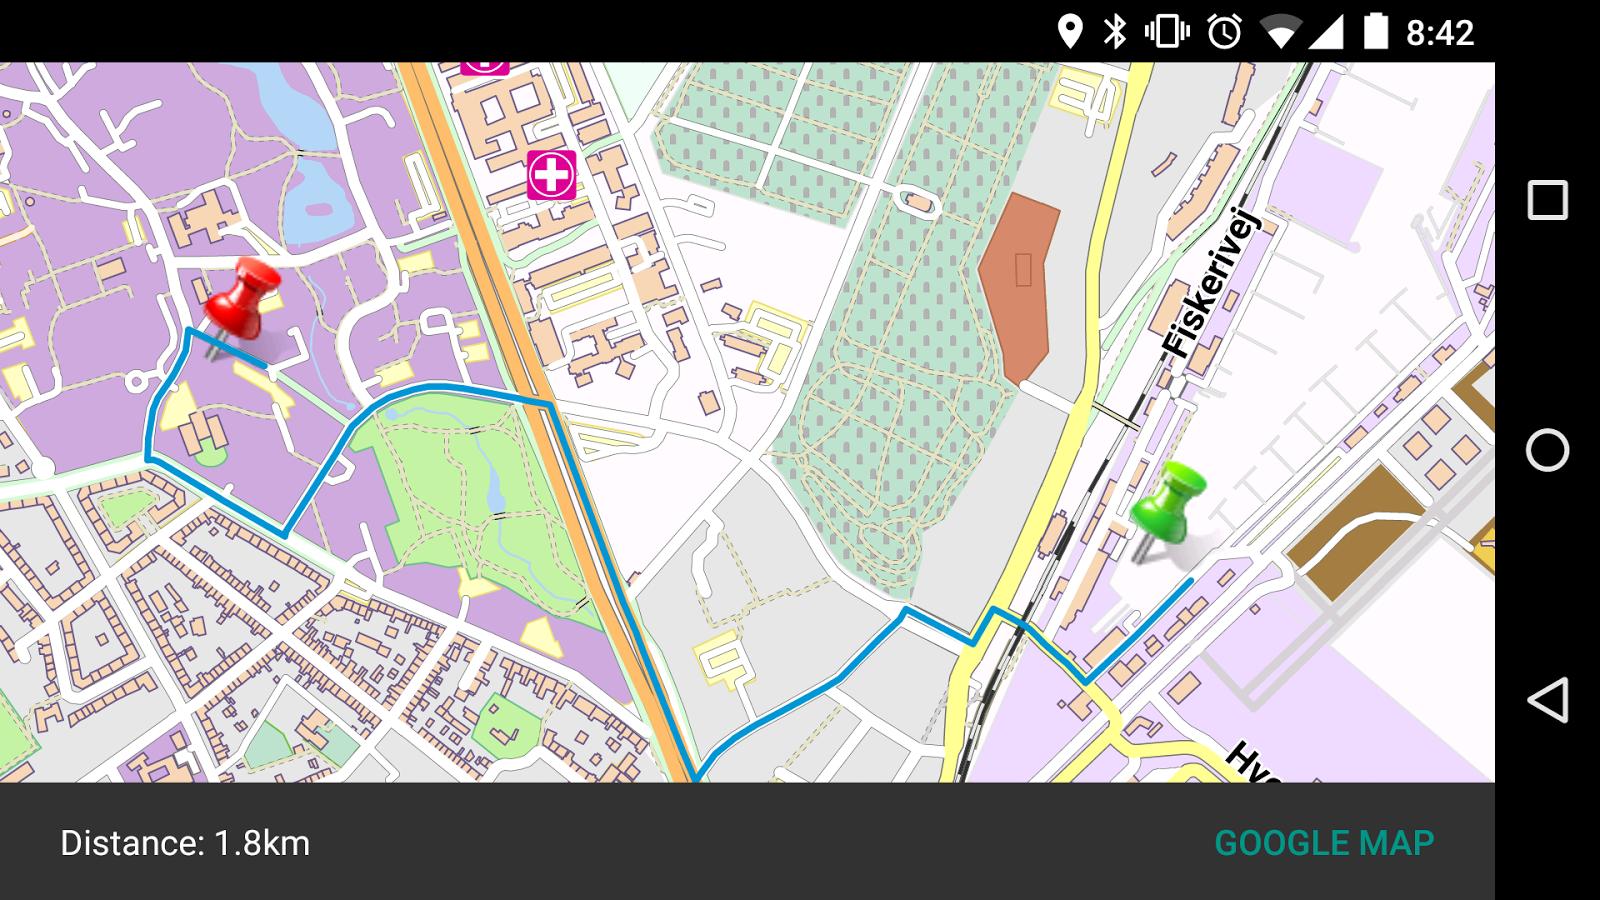 KAMPALA UGANDA MAP Android Apps On Google Play - Uganda map hd